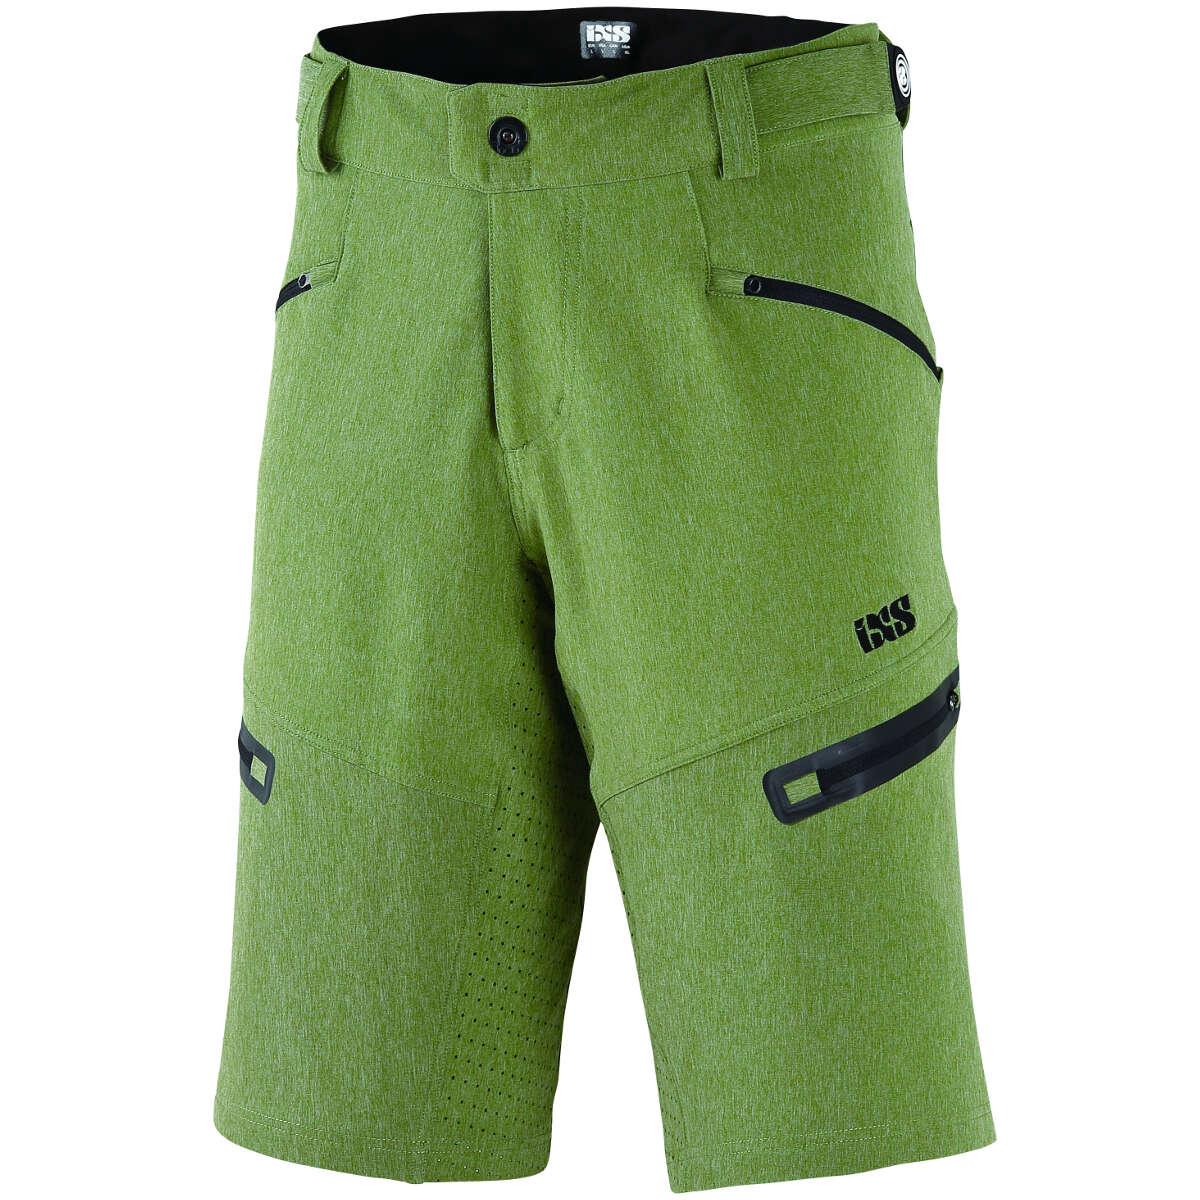 IXS Downhill-Short 6.1 Sever 6.1 Downhill-Short Oliv 96251e